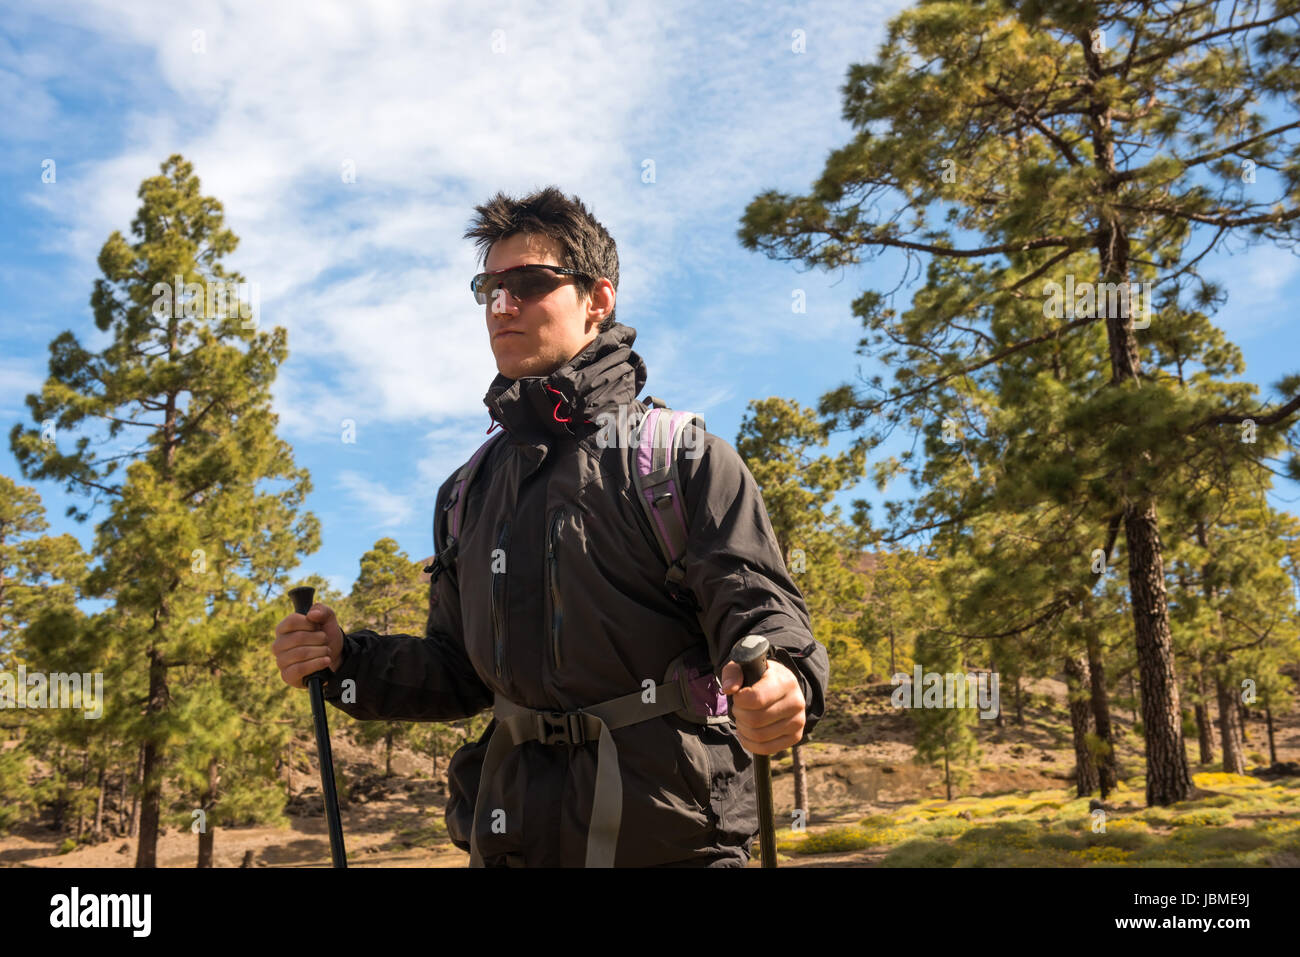 Wanderer Mensch Wandern im Wald Tenefire, Kanarischen Stockbild